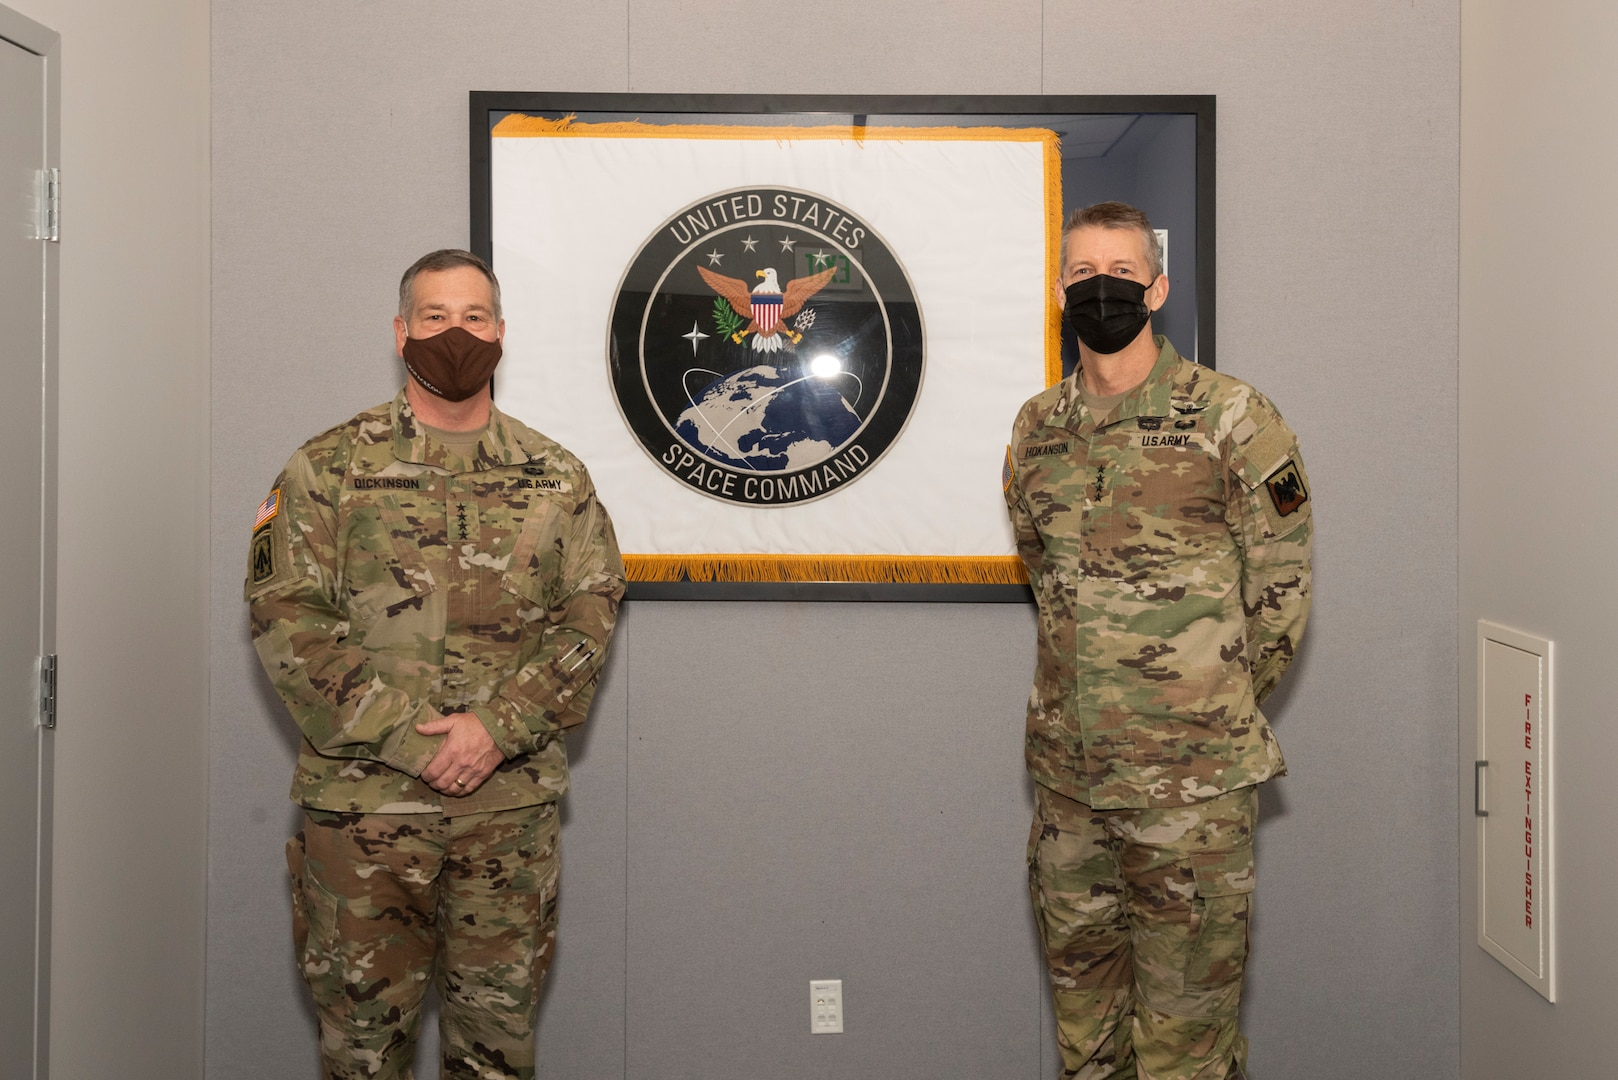 Army generals